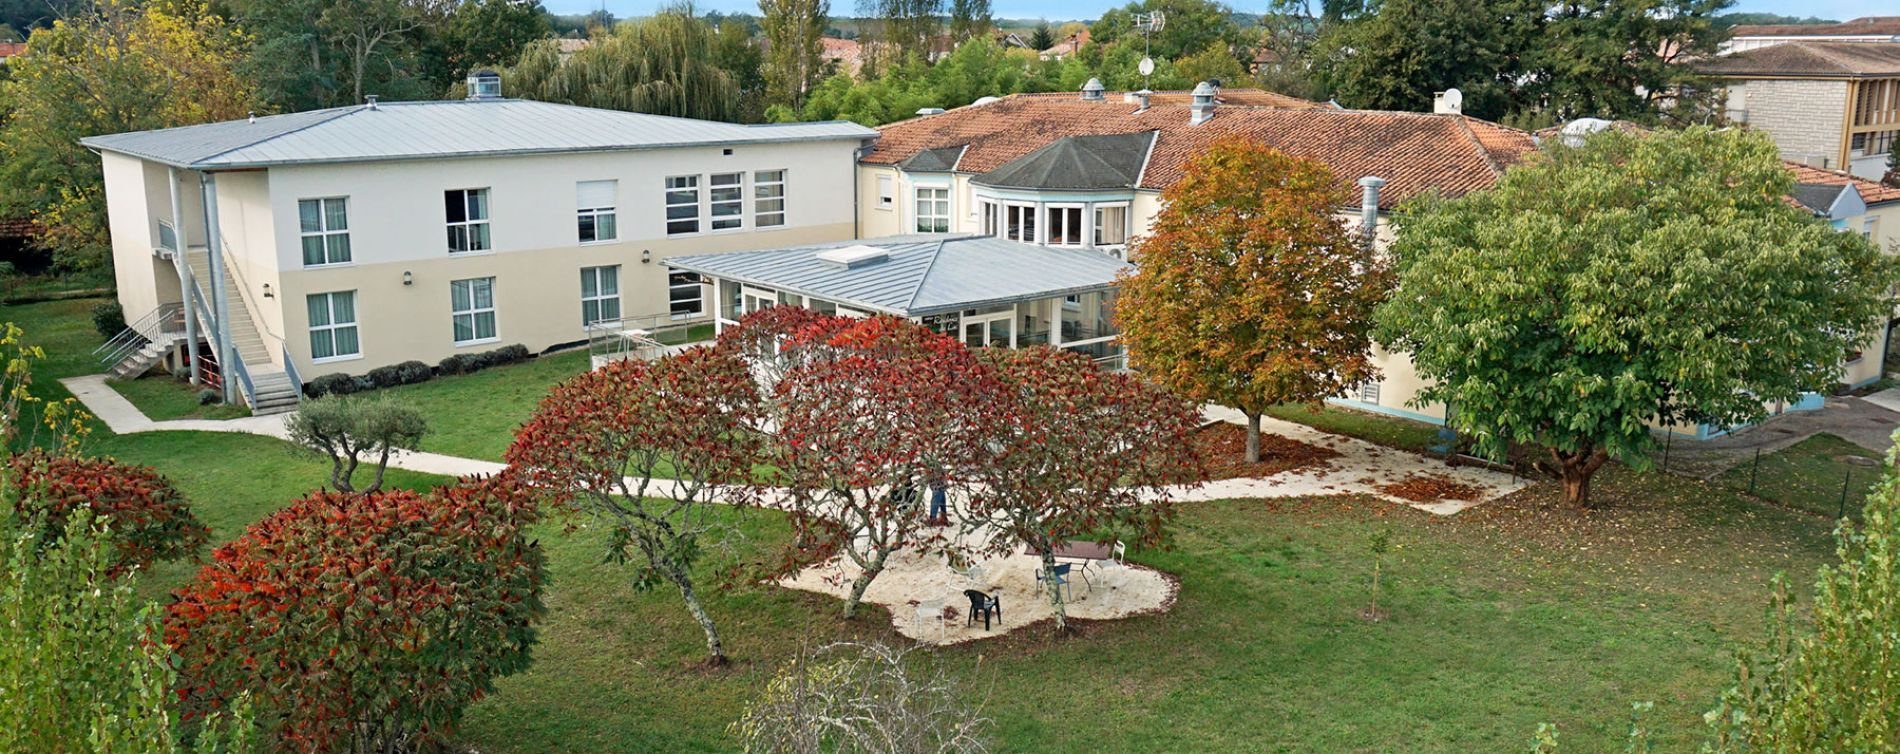 Résidence Résidence du Lac à Casteljaloux